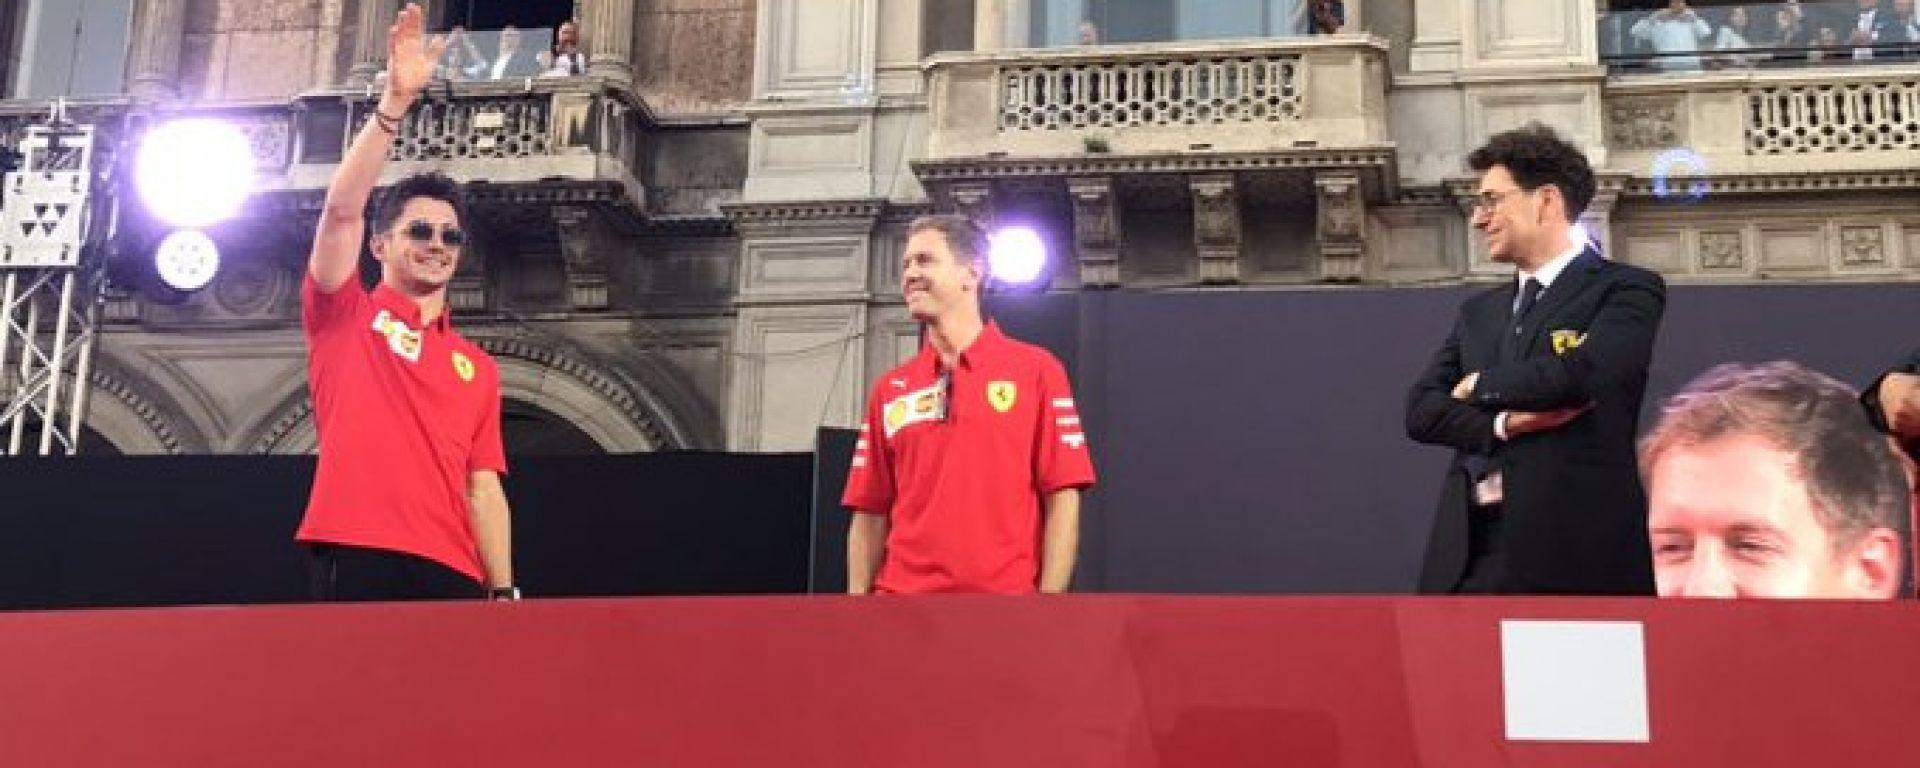 Festa 90 anni Ferrari, piazza Duomo, Milano: Charles Leclerc, Sebastian Vettel e Mattia Binotto